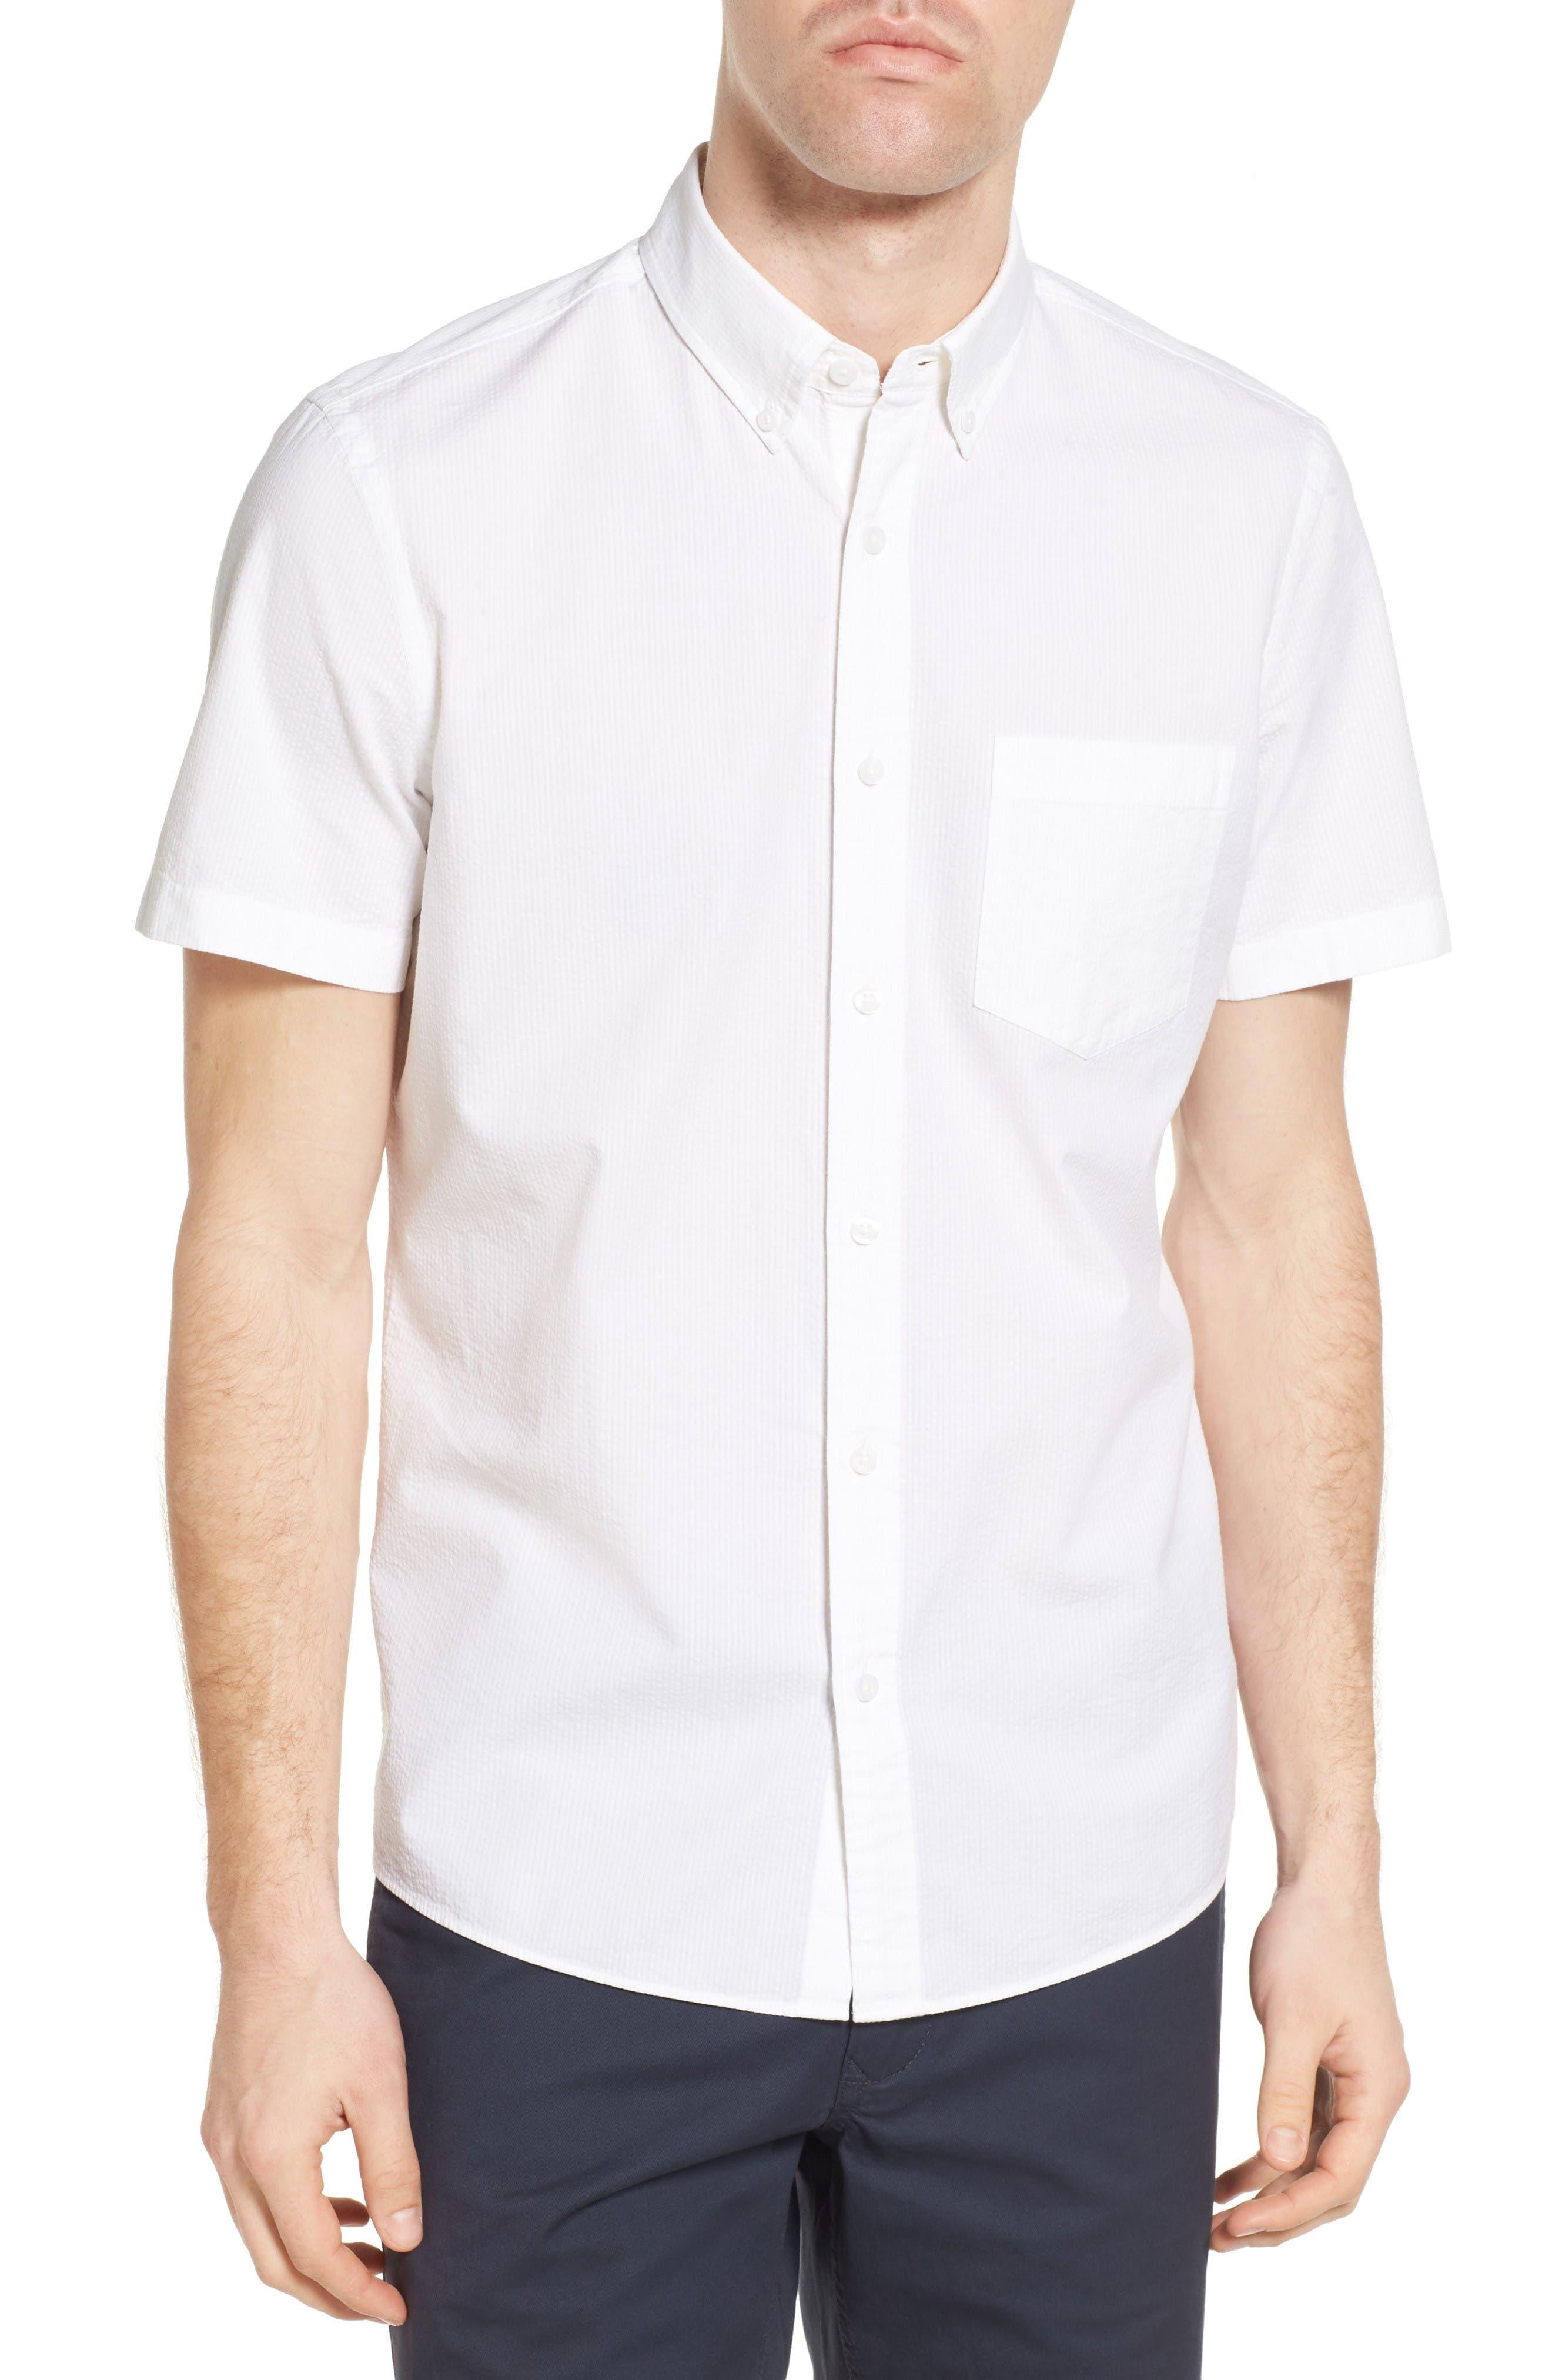 Nordstrom Men's Shop Slim Fit Seersucker Sport Shirt (Regular & Tall)